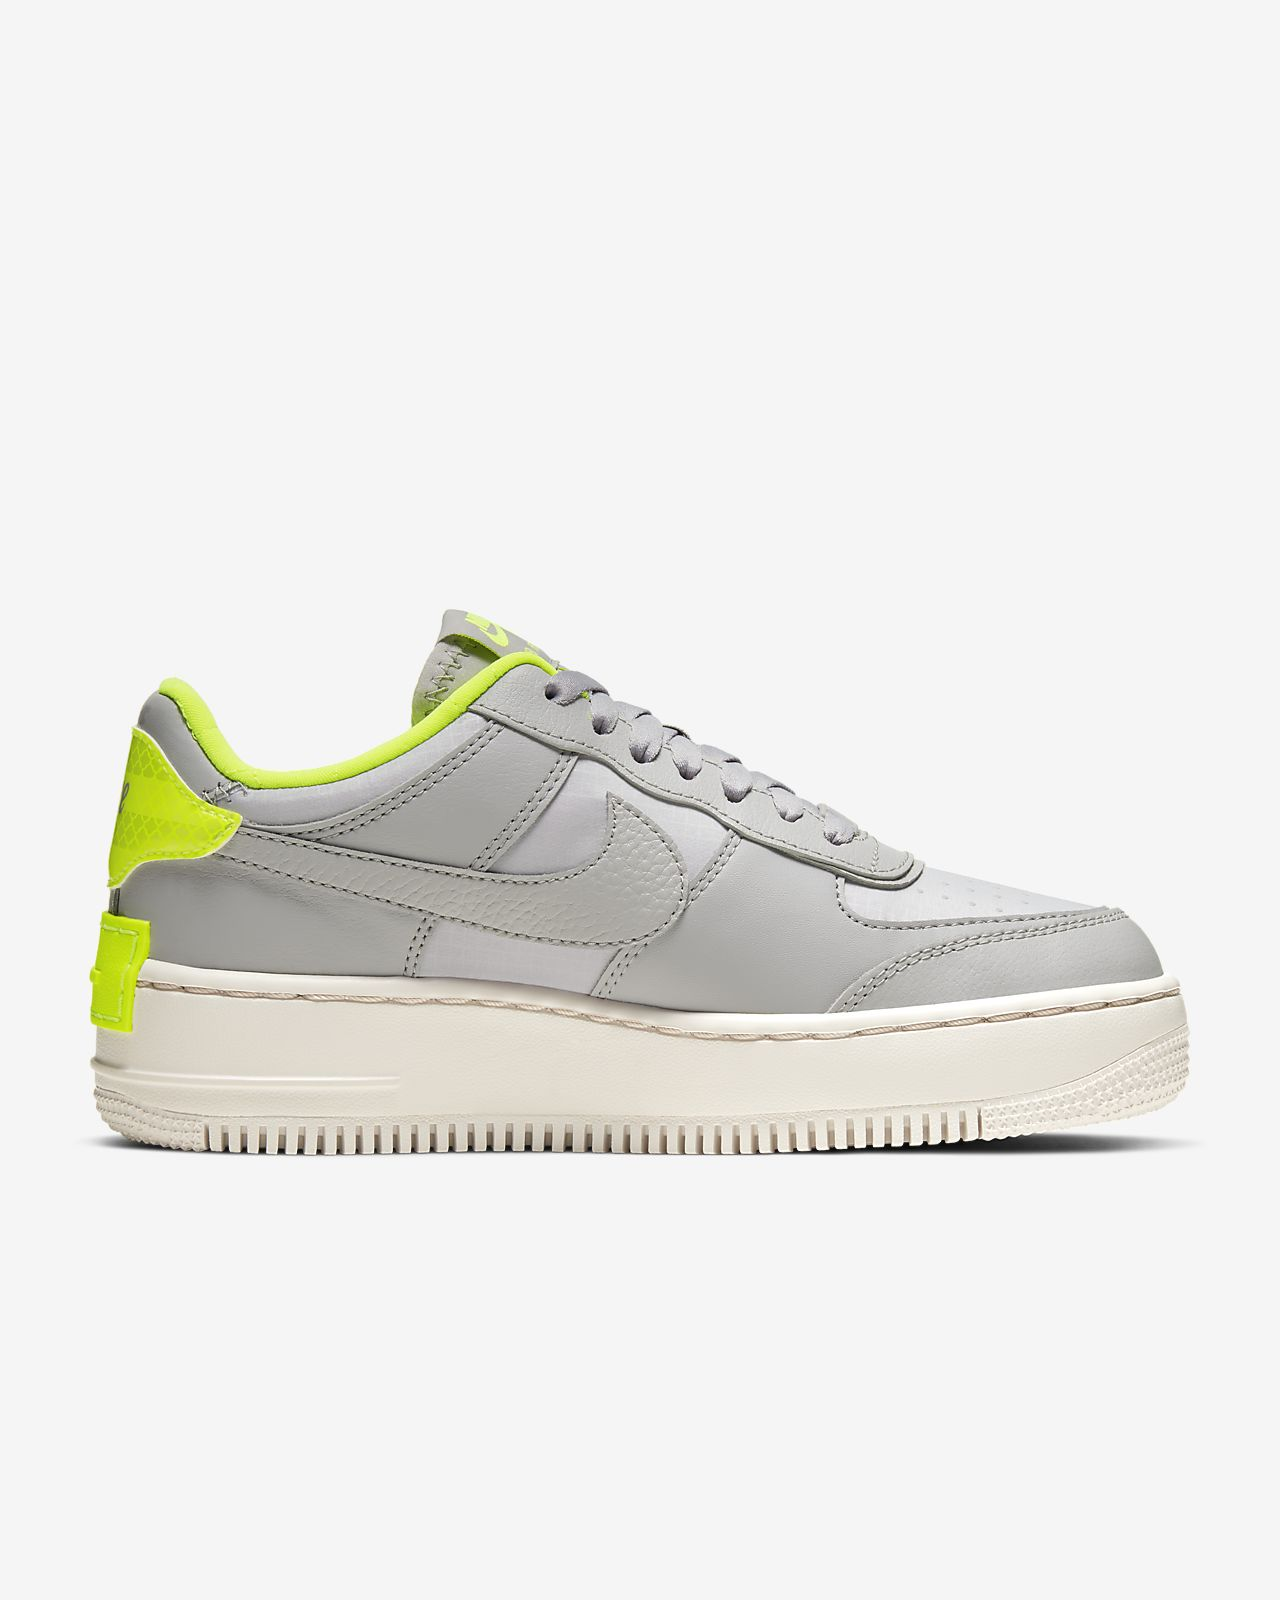 Nike Air Force 1 Shadow SE Atmosphere Grey Volt CQ3317 002